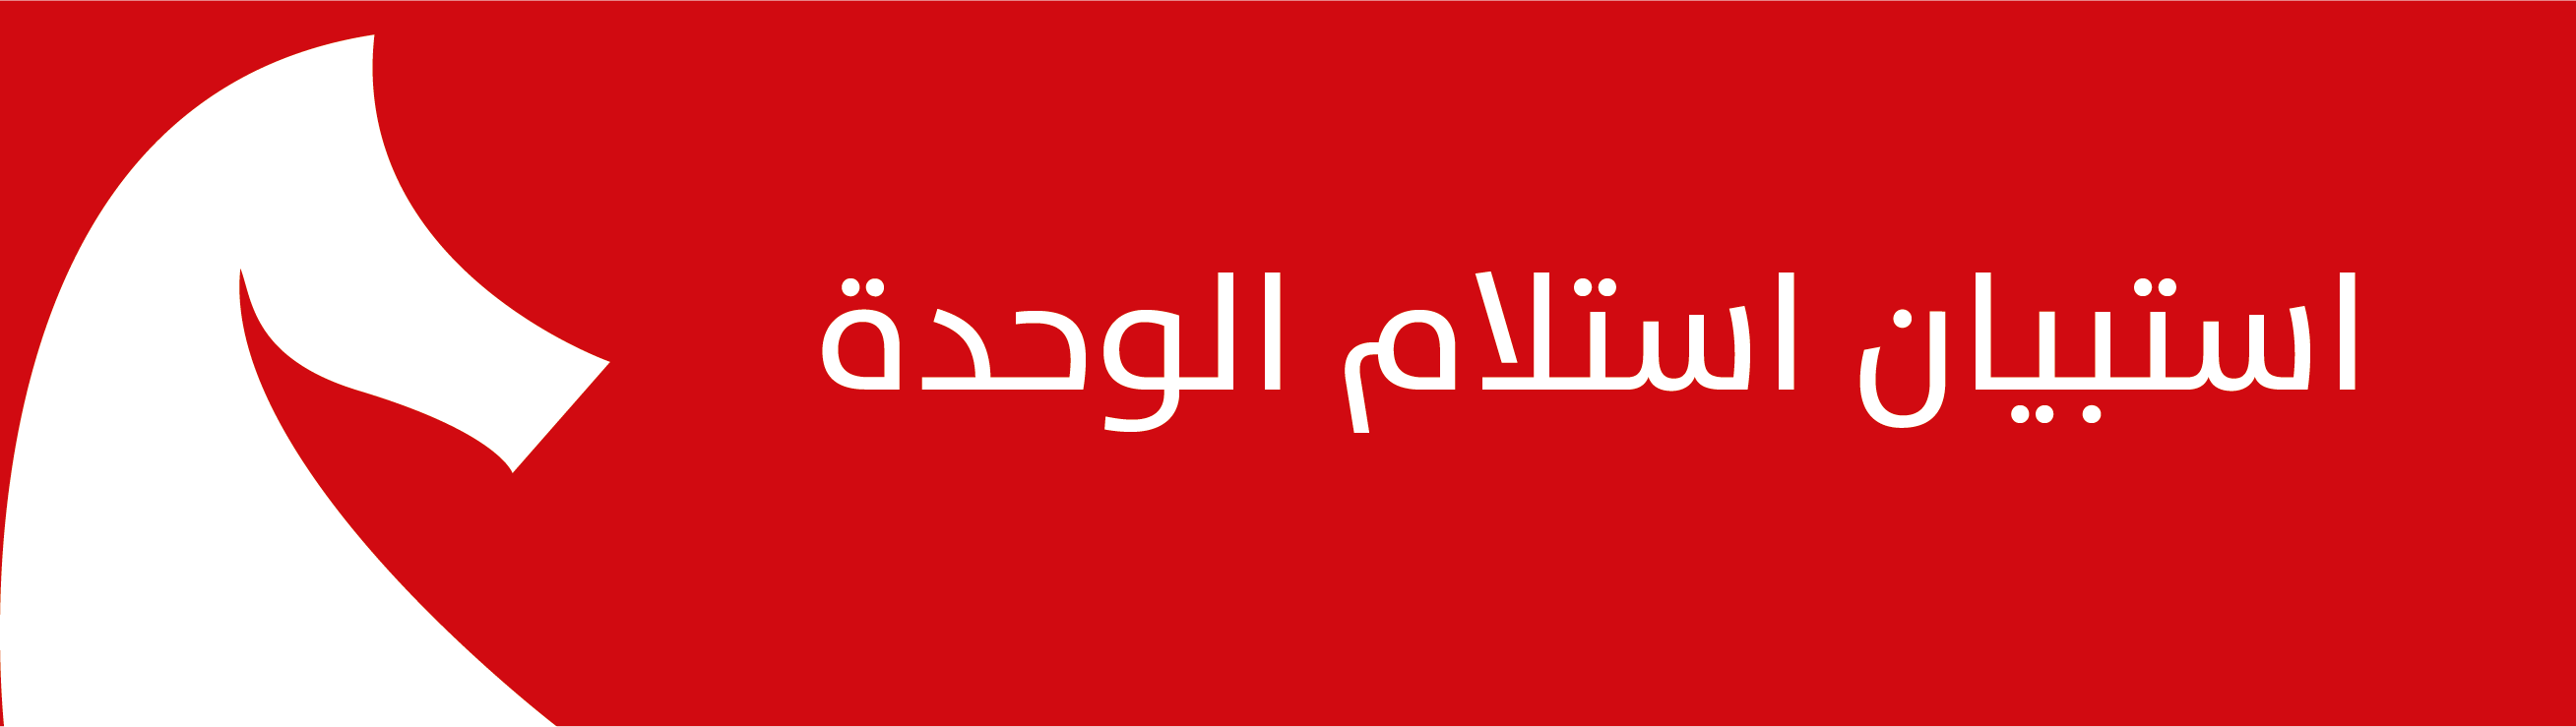 rd banner form -04